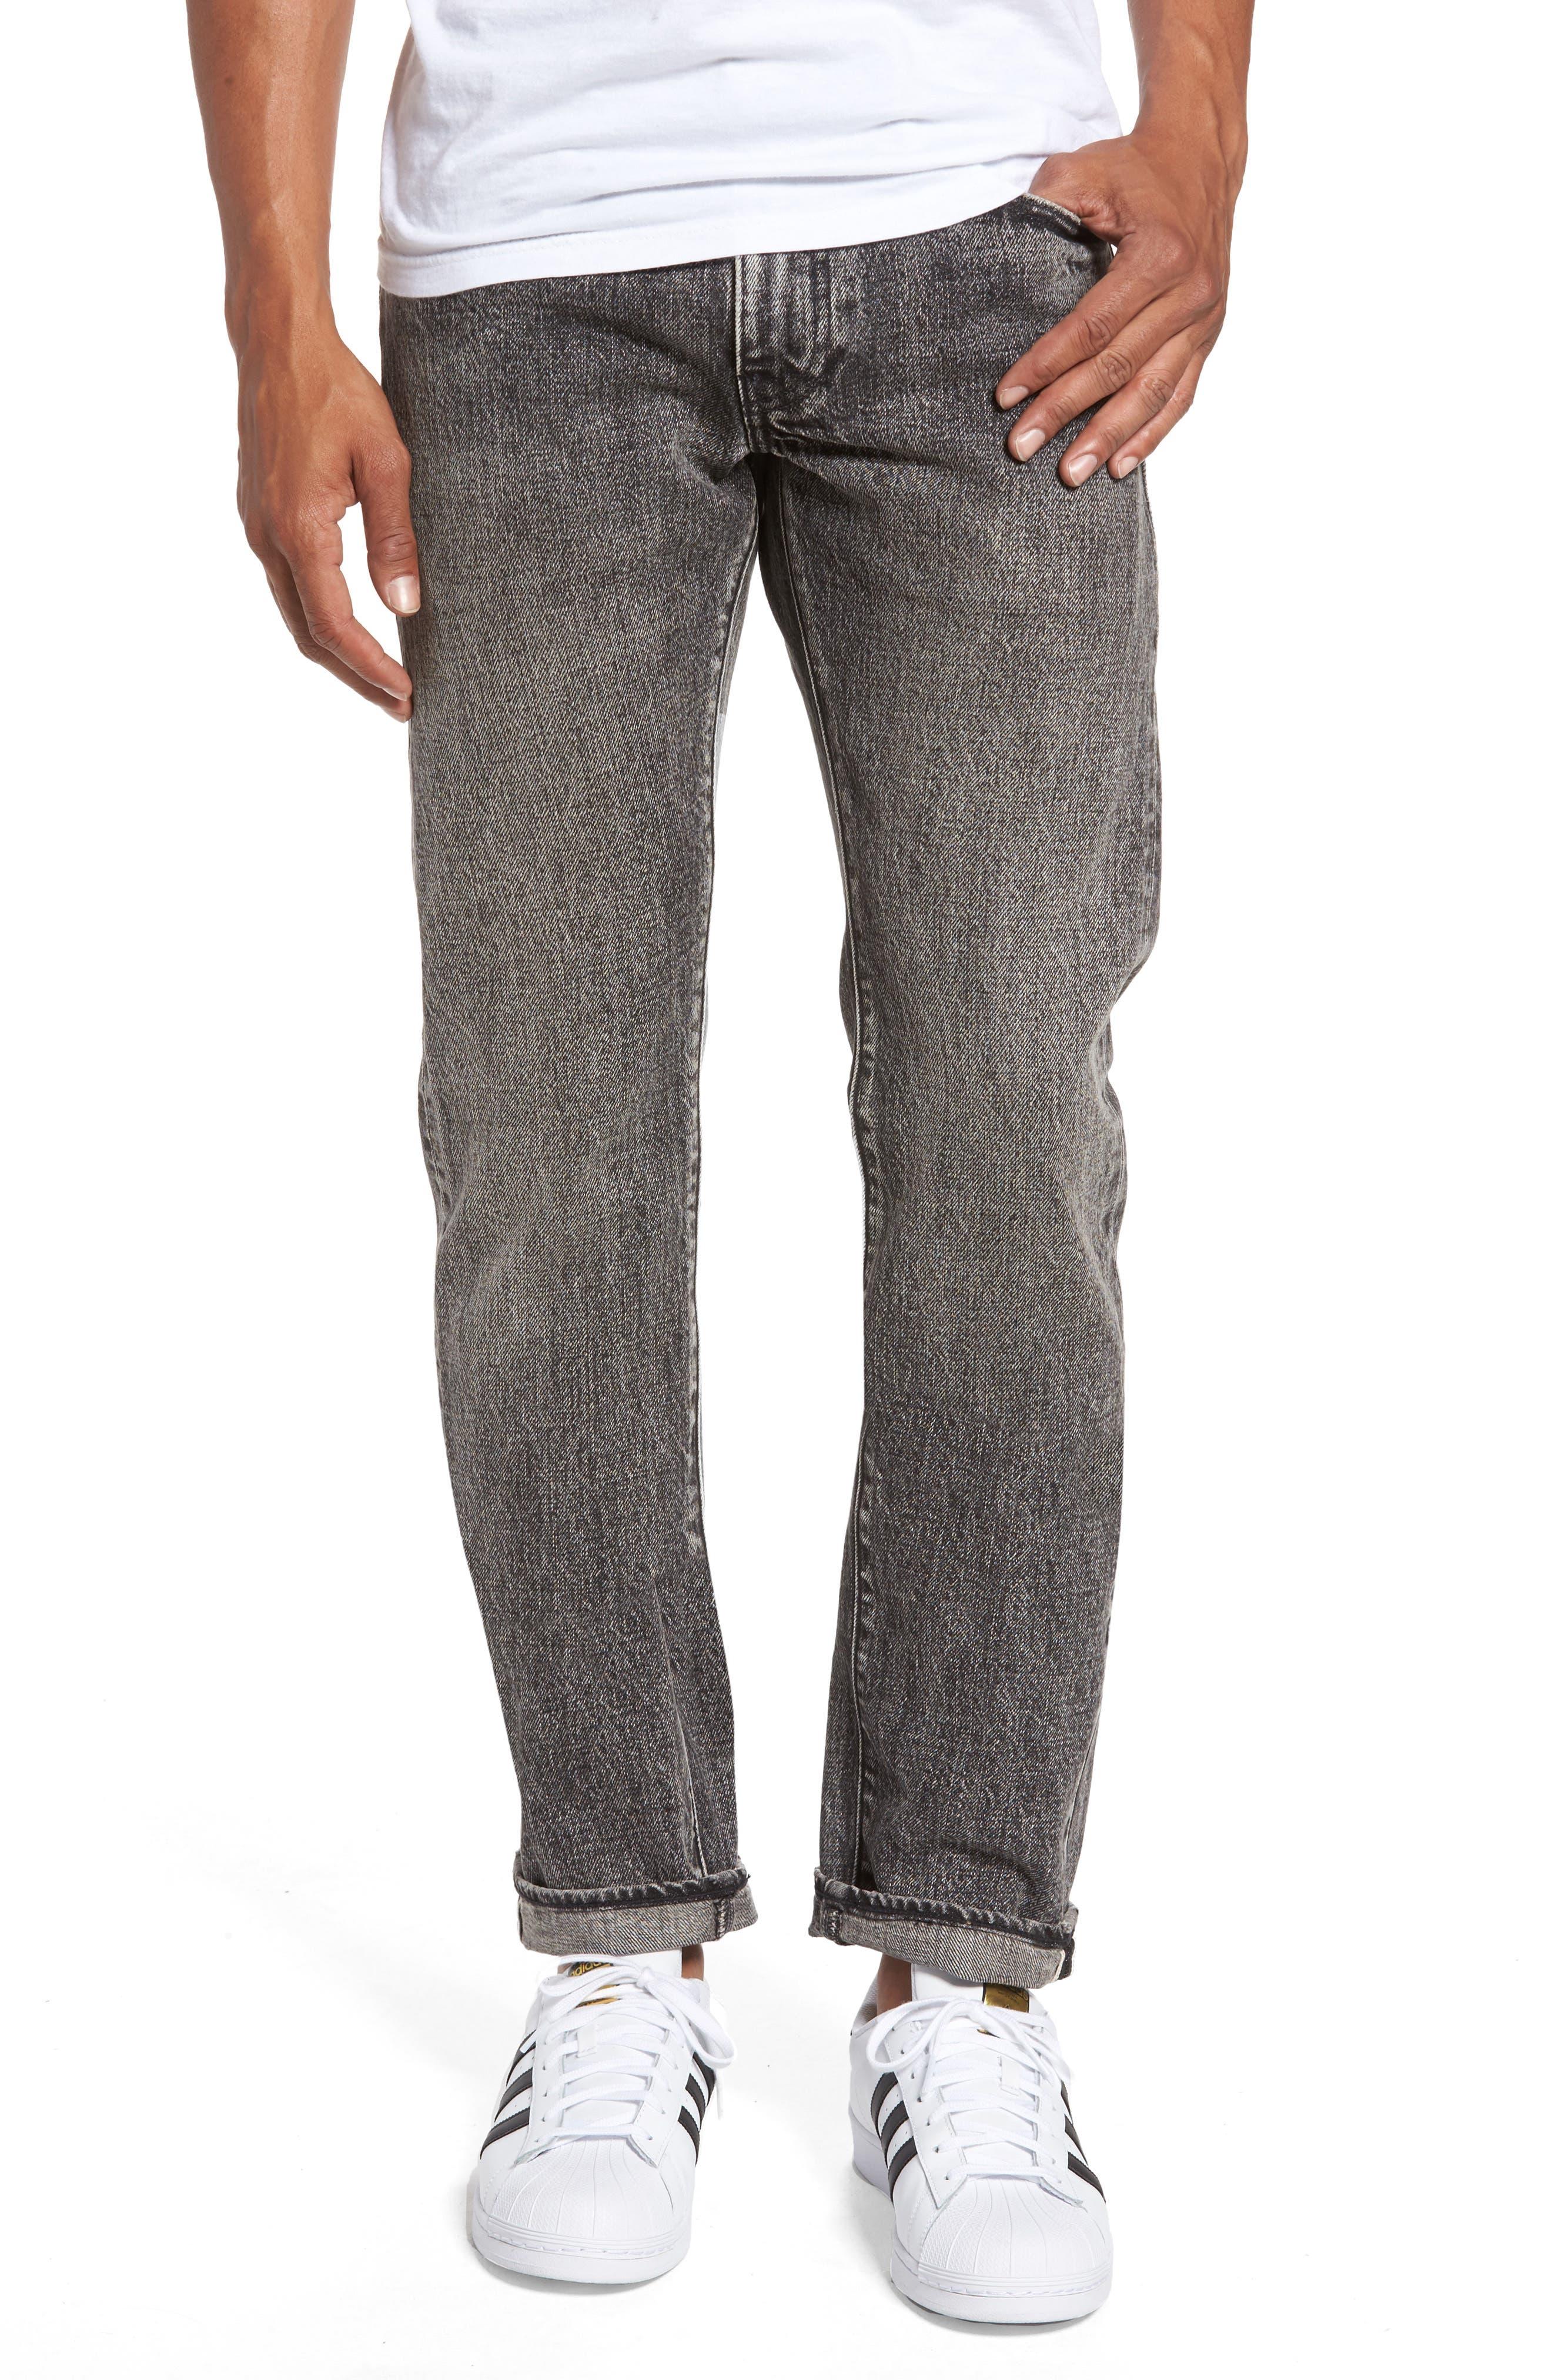 Main Image - Levi's® 511™ Slim Fit Jeans (Heavy Sabeth)